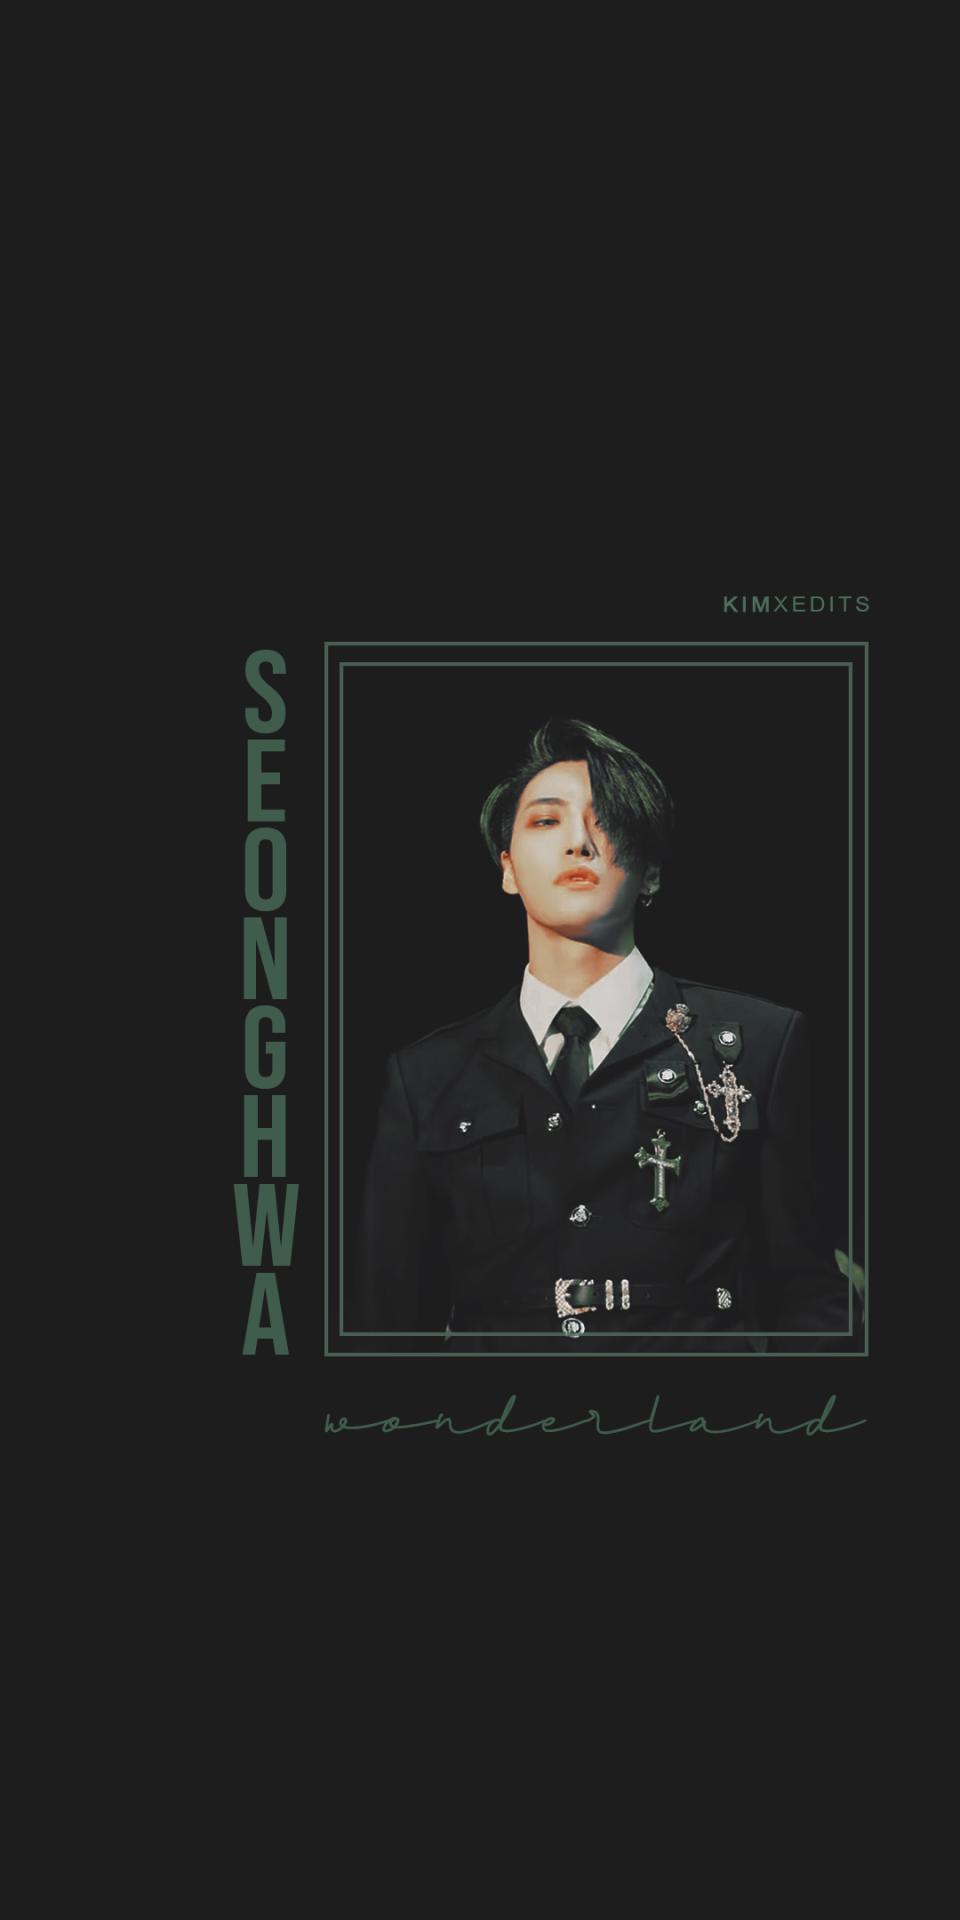 Ateez Seonghwa Wonderland Wallpaper ateez seonghwa